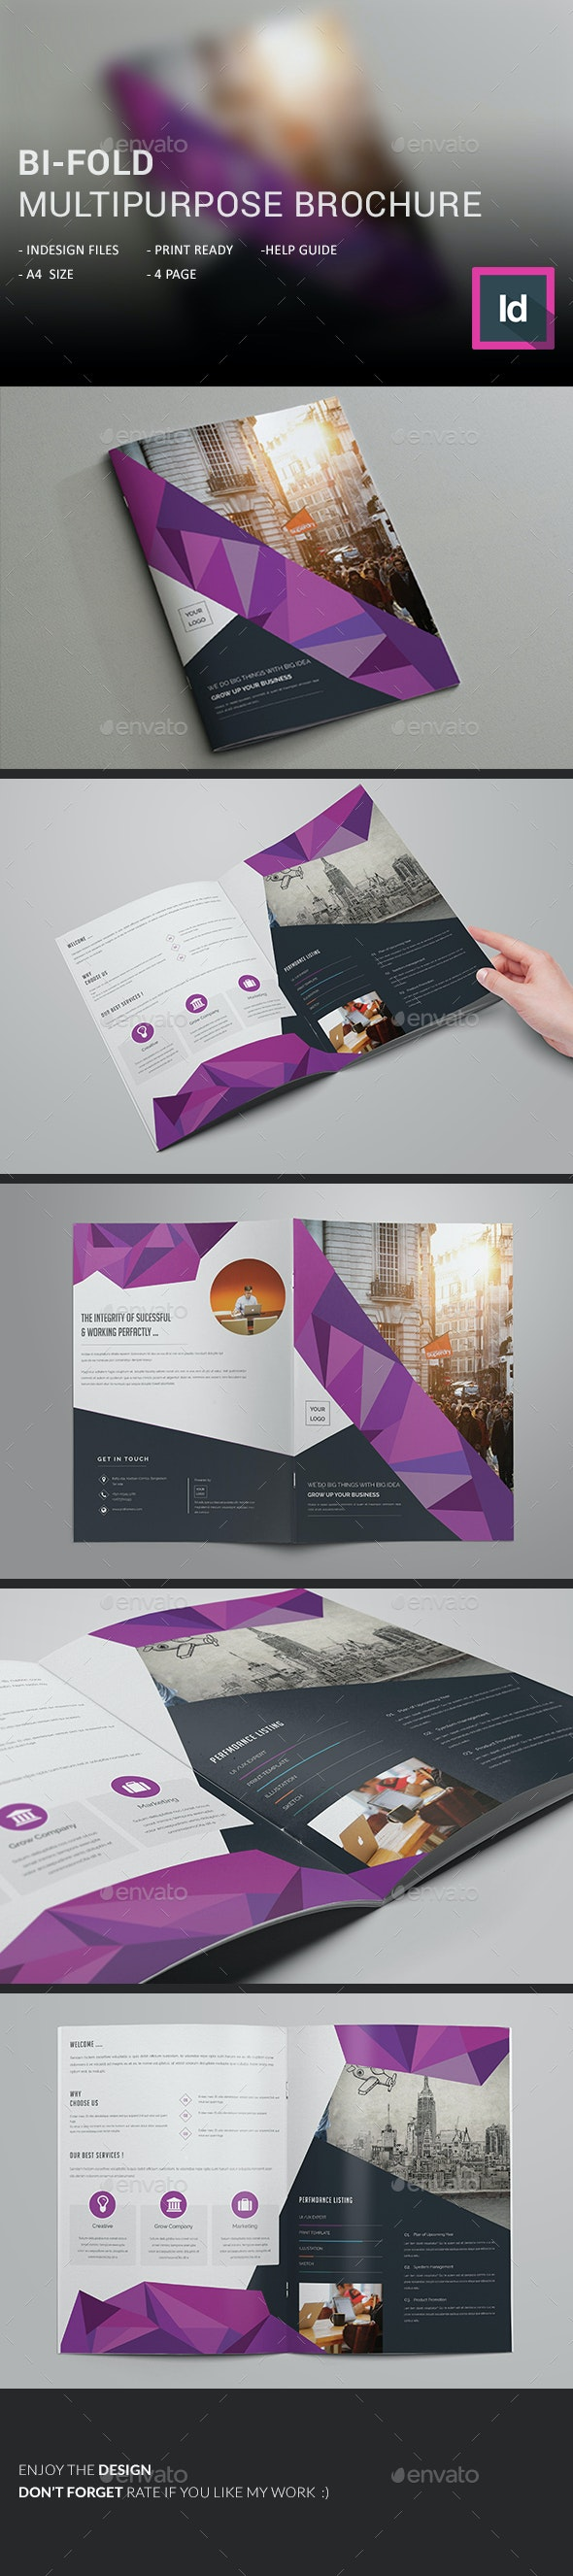 Bi-Fold Multipurpose Brochure - Corporate Brochures